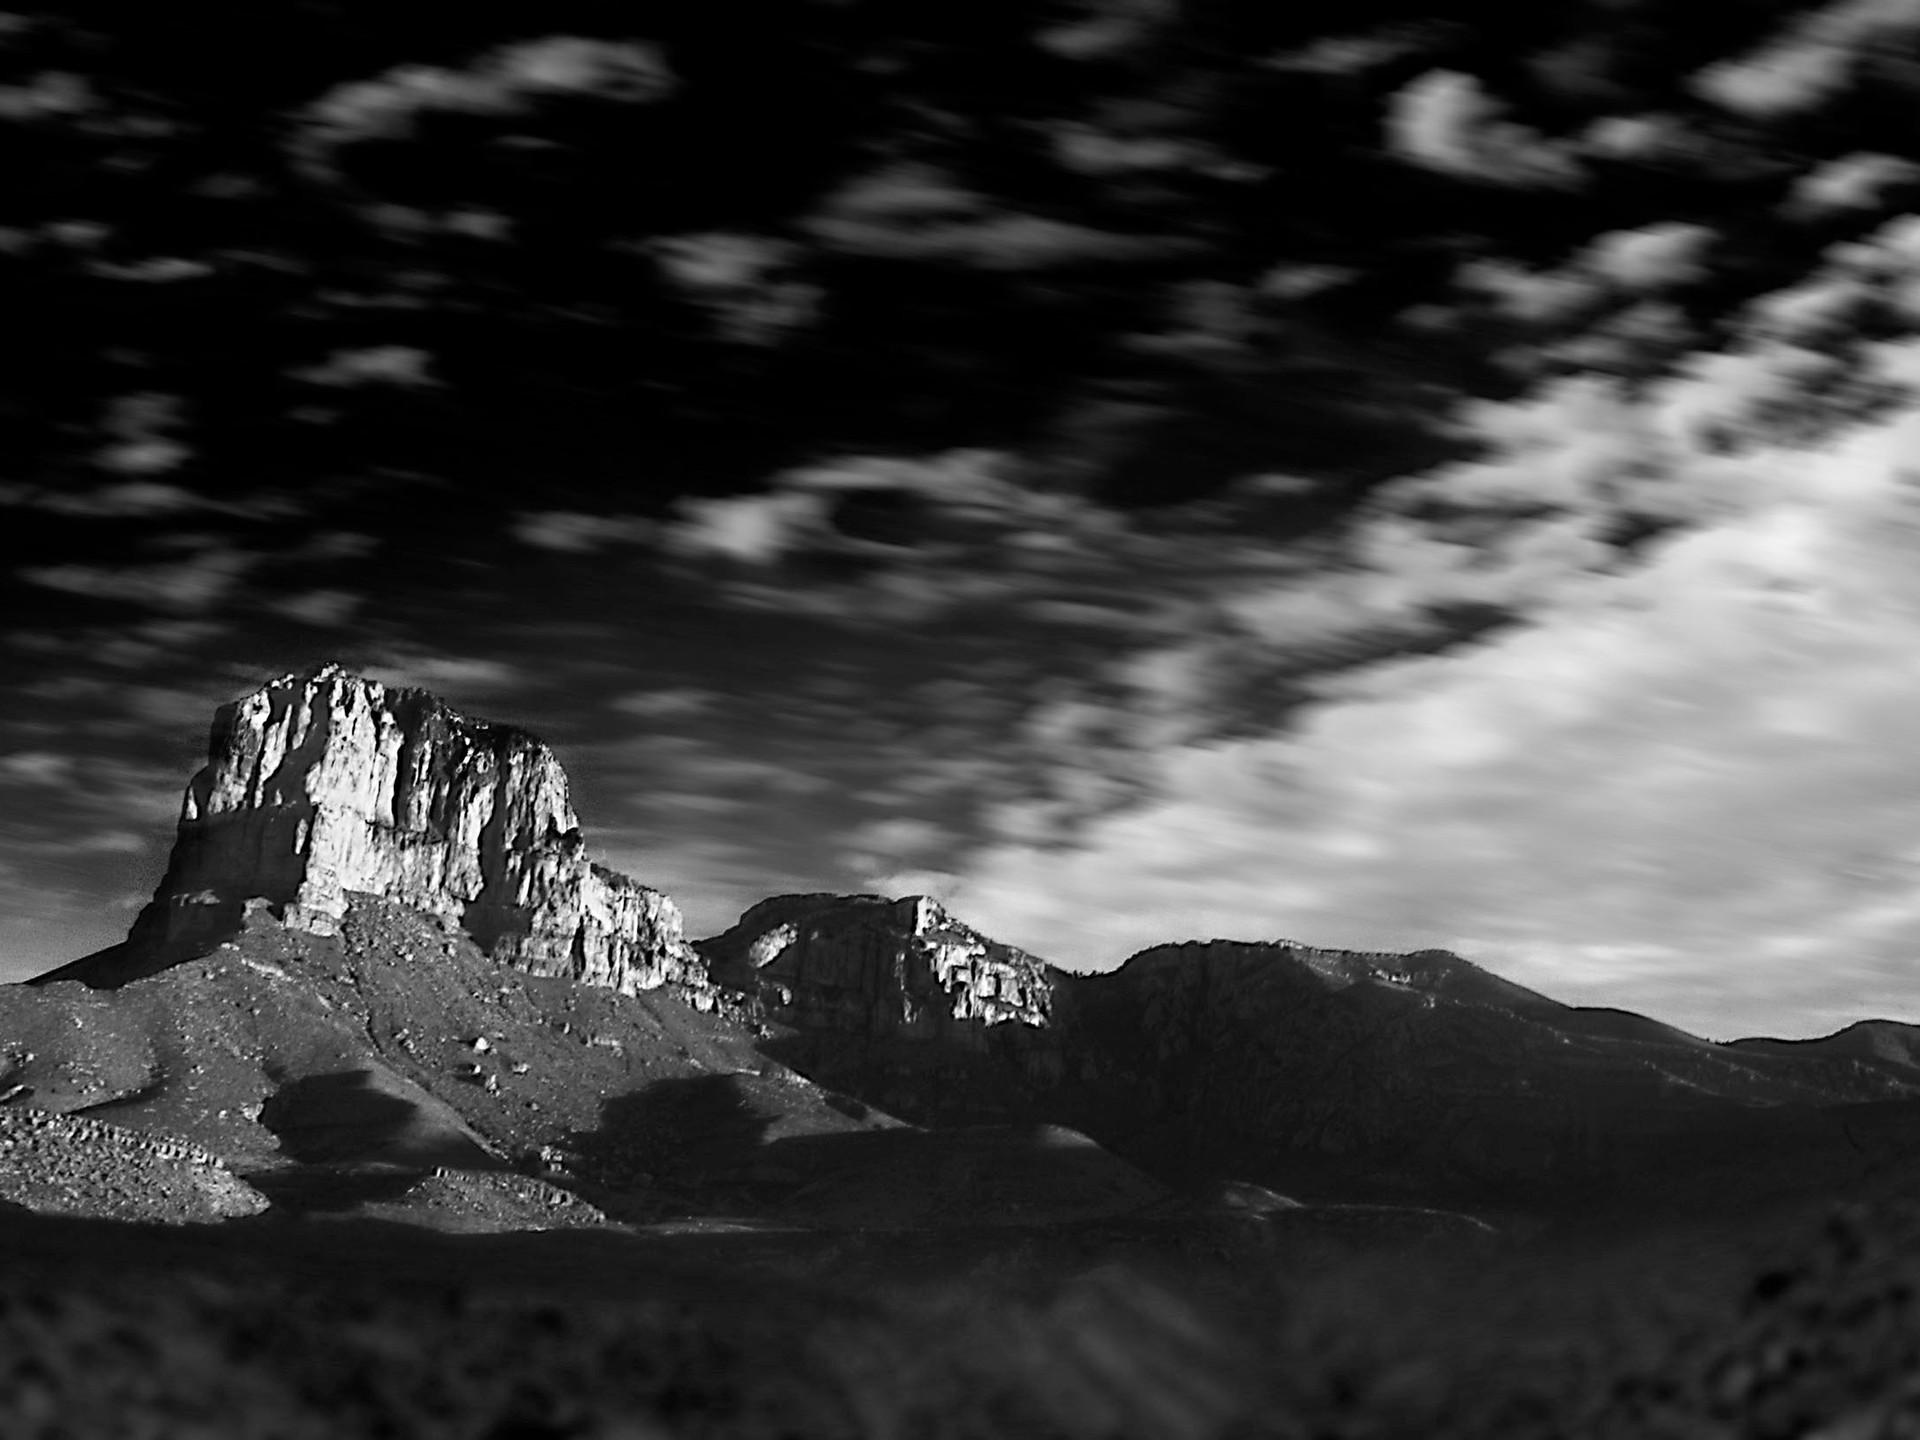 GUADALUPE MOUNTAIN